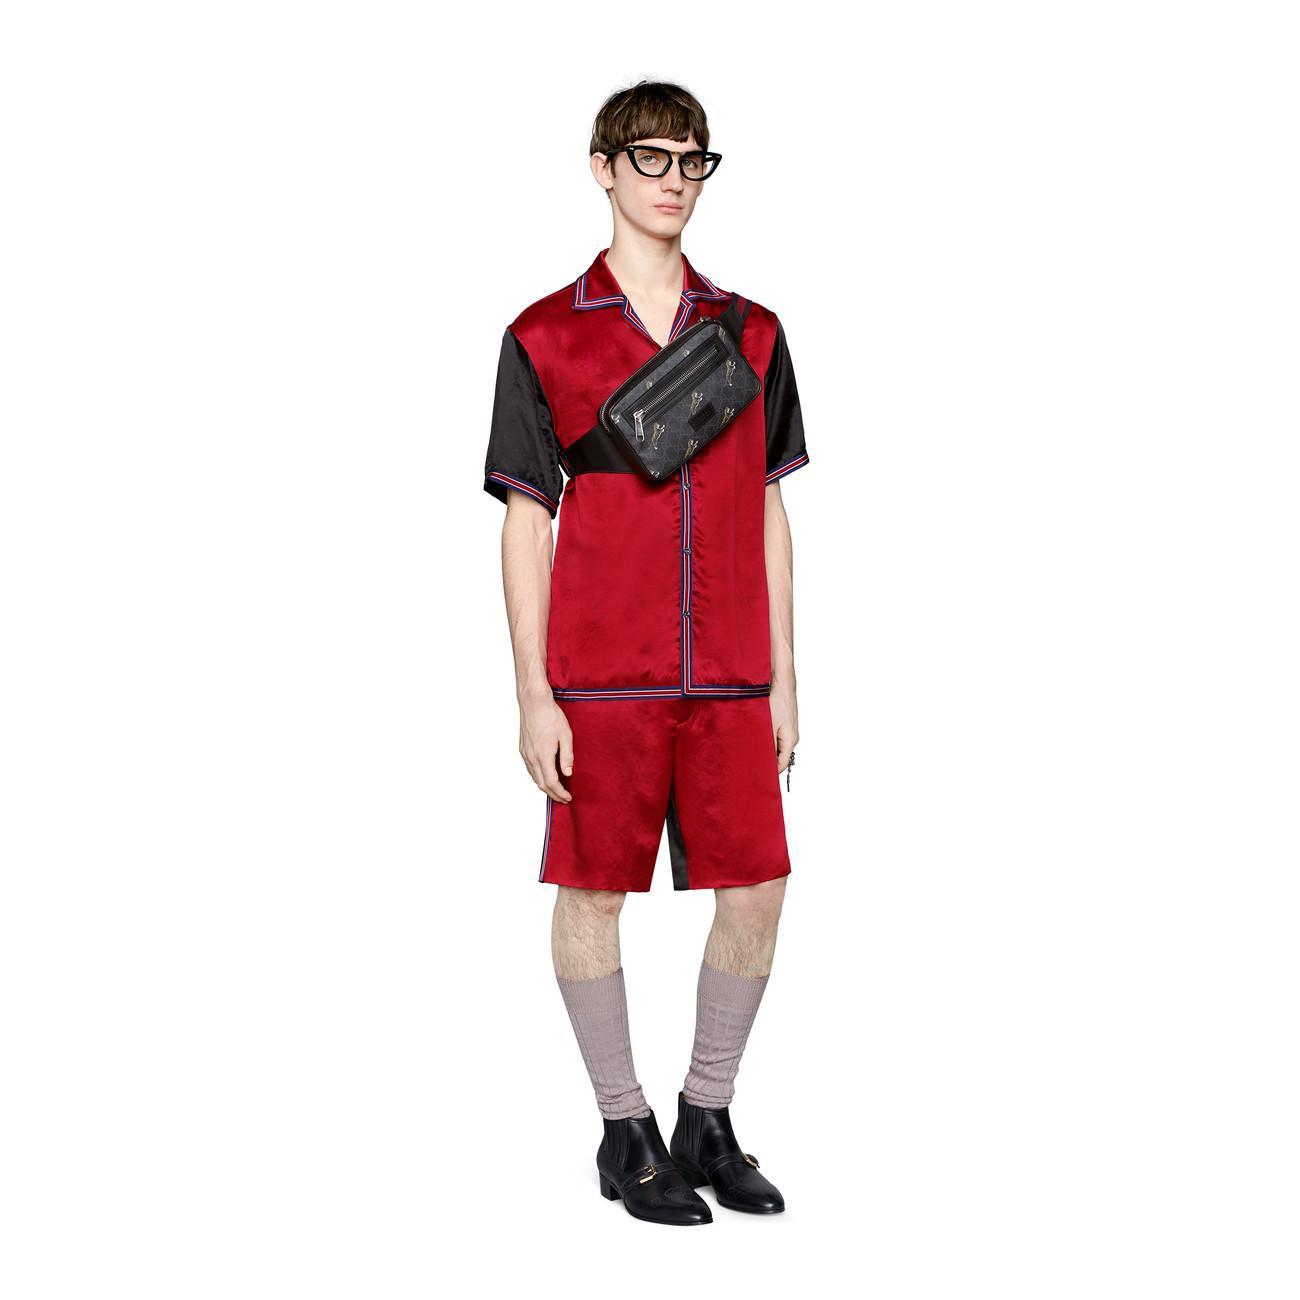 8413aa5a29f0 ... Soft GG Supreme Tigers Belt Bag for Men - Lyst. View fullscreen